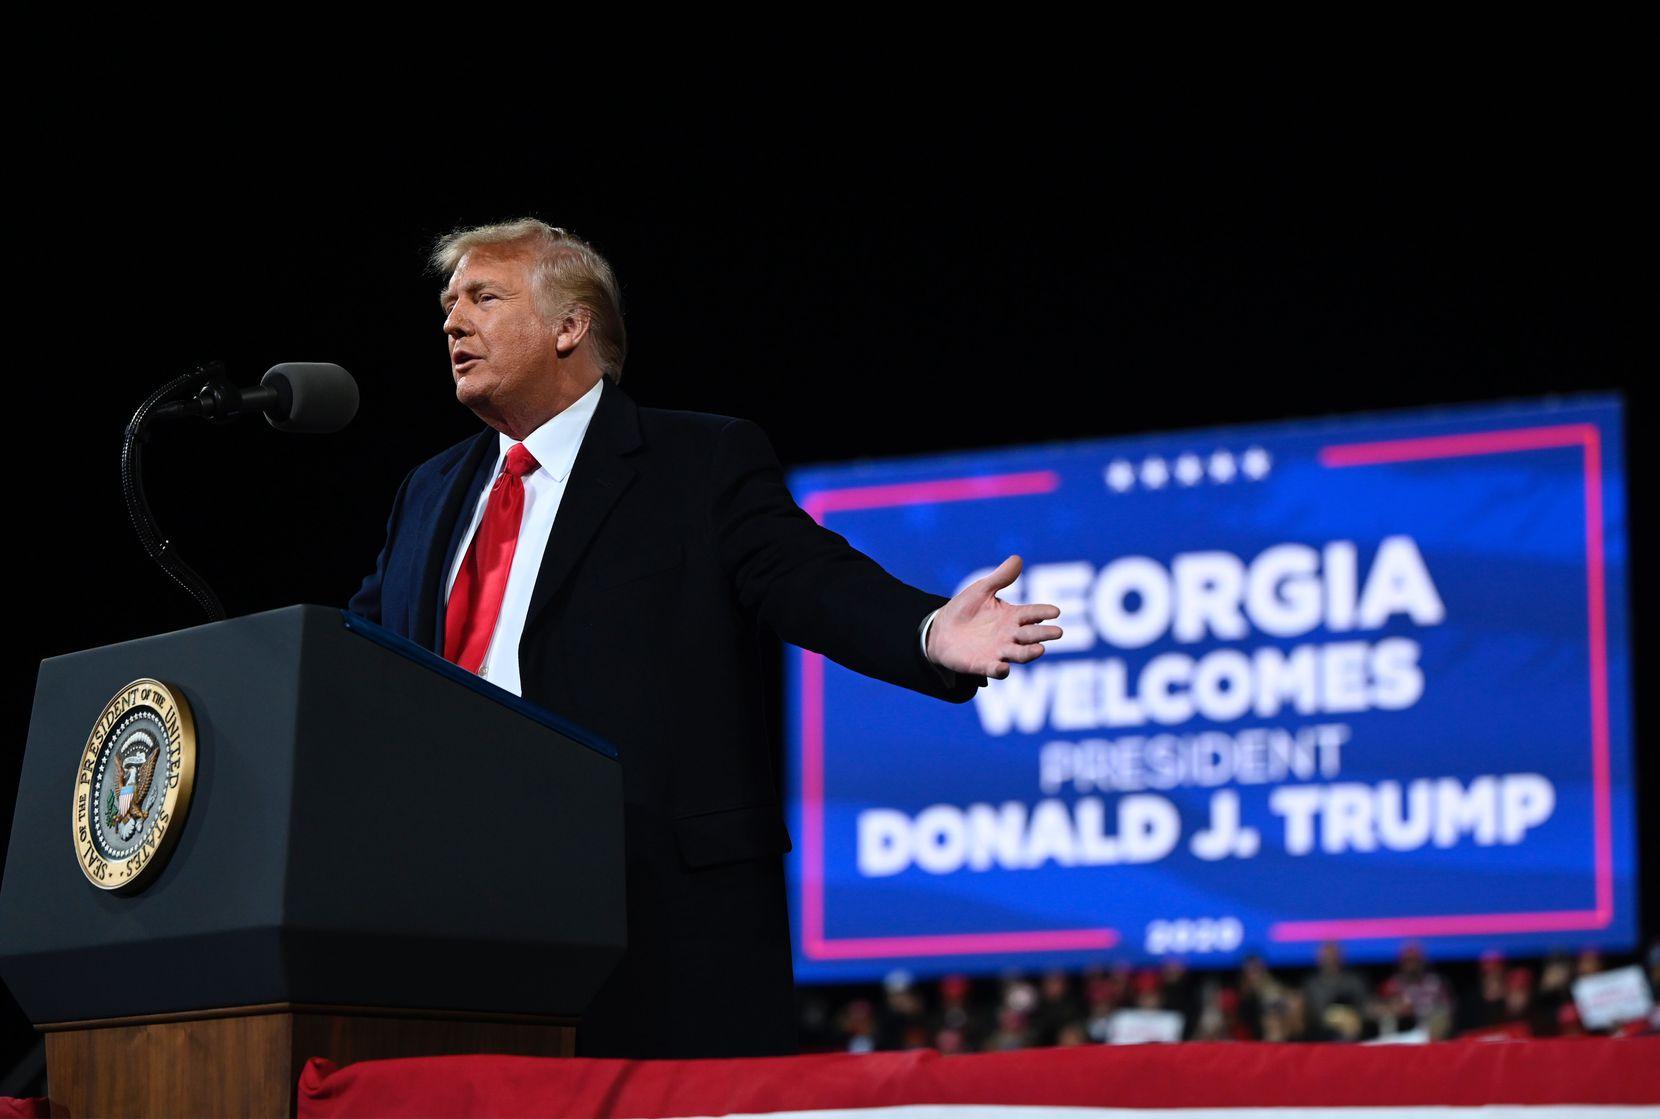 President Donald Trump speaks at a rally in support of Republican U.S. Senate candidates Kelly Loeffler and David Perdue at Valdosta Regional Airport in Valdosta, Ga., on Saturday.